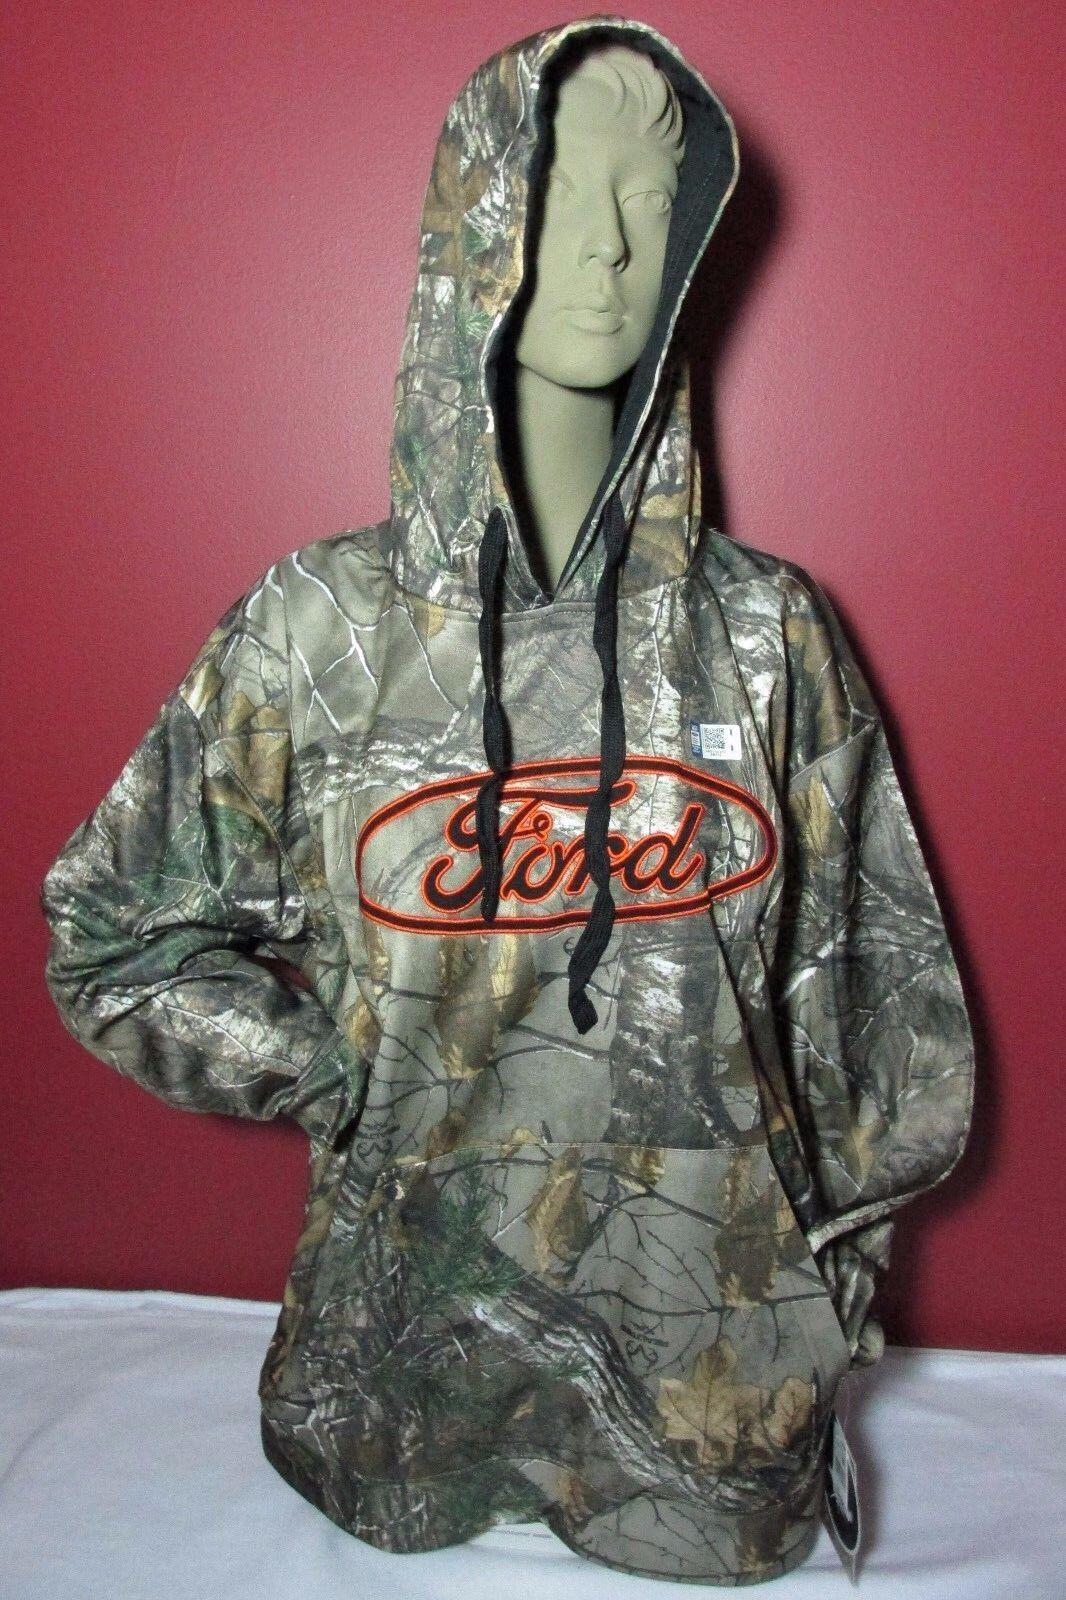 NEW Camouflage FORD Hoodie Men's Size Medium Realtree Hooded Sweatshirt